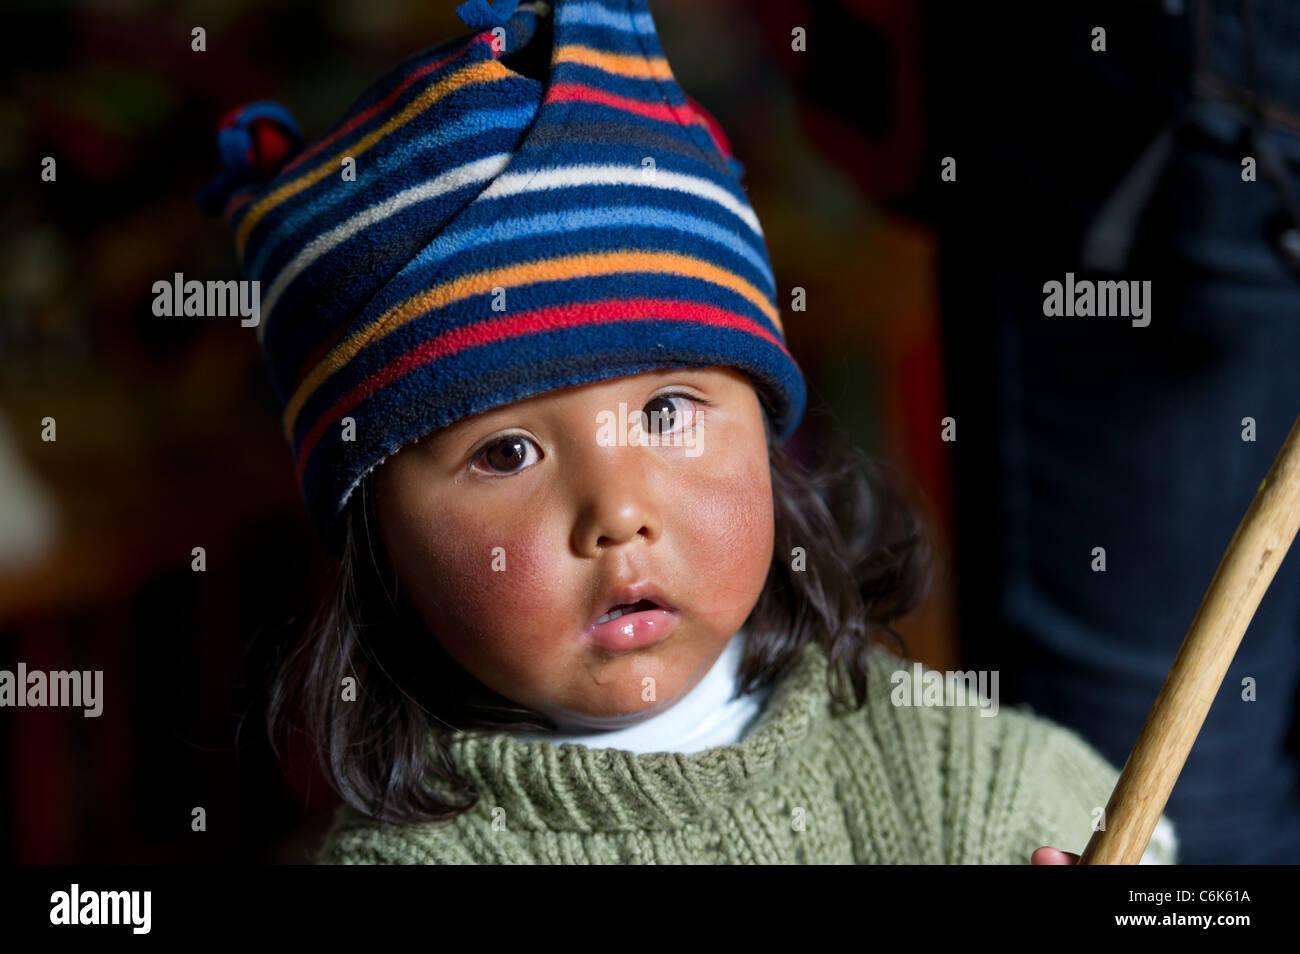 Portrait of a girl wearing a knit hat, Barrio de San Blas, Cuzco, Peru - Stock Image